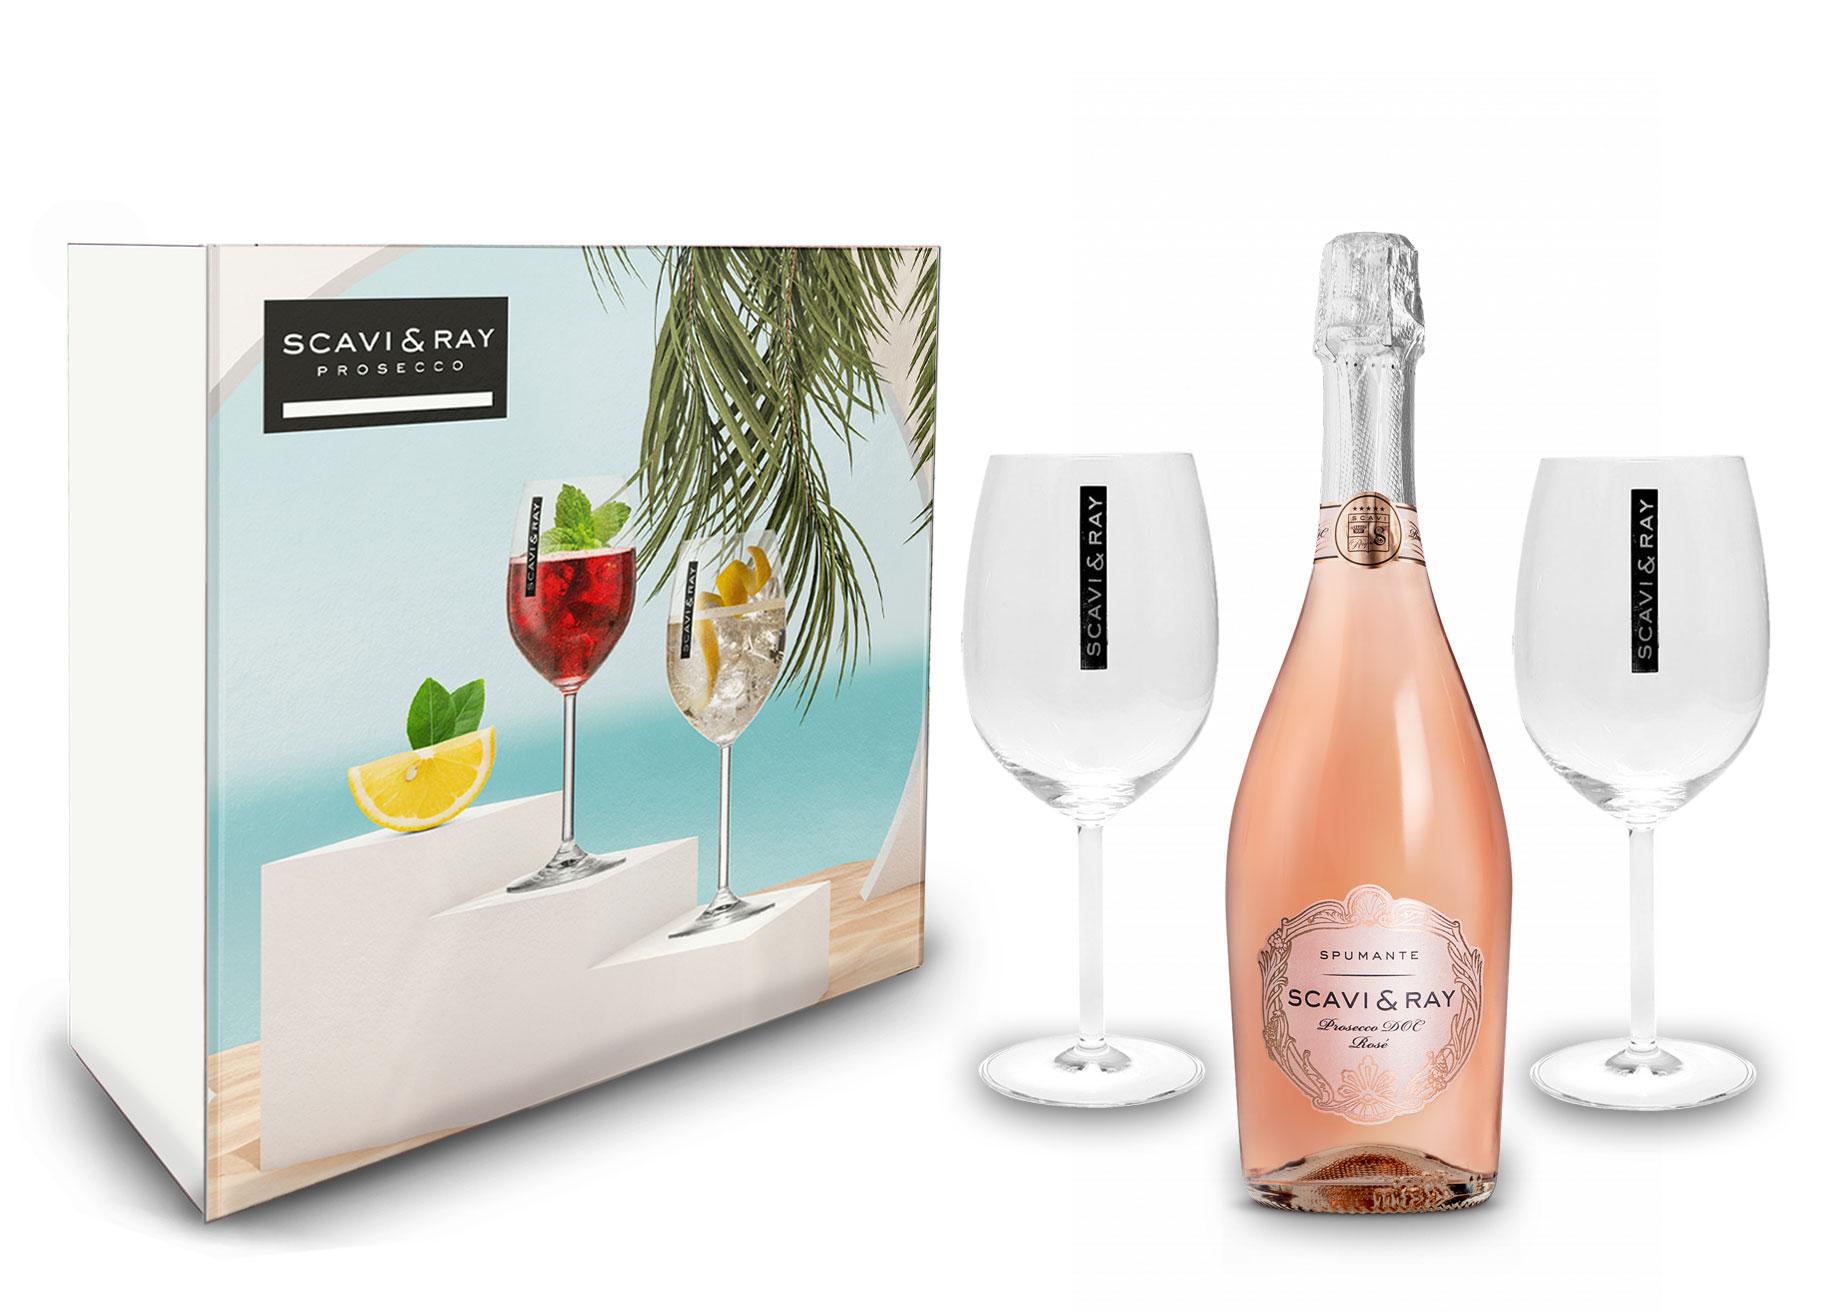 Scavi & Ray Geschenkset Scavi Ray Rosé Spumante DOC 0,75L (11% Vol) + 2 Wein Gläser Ballonglas- [Enthält Sulfite]